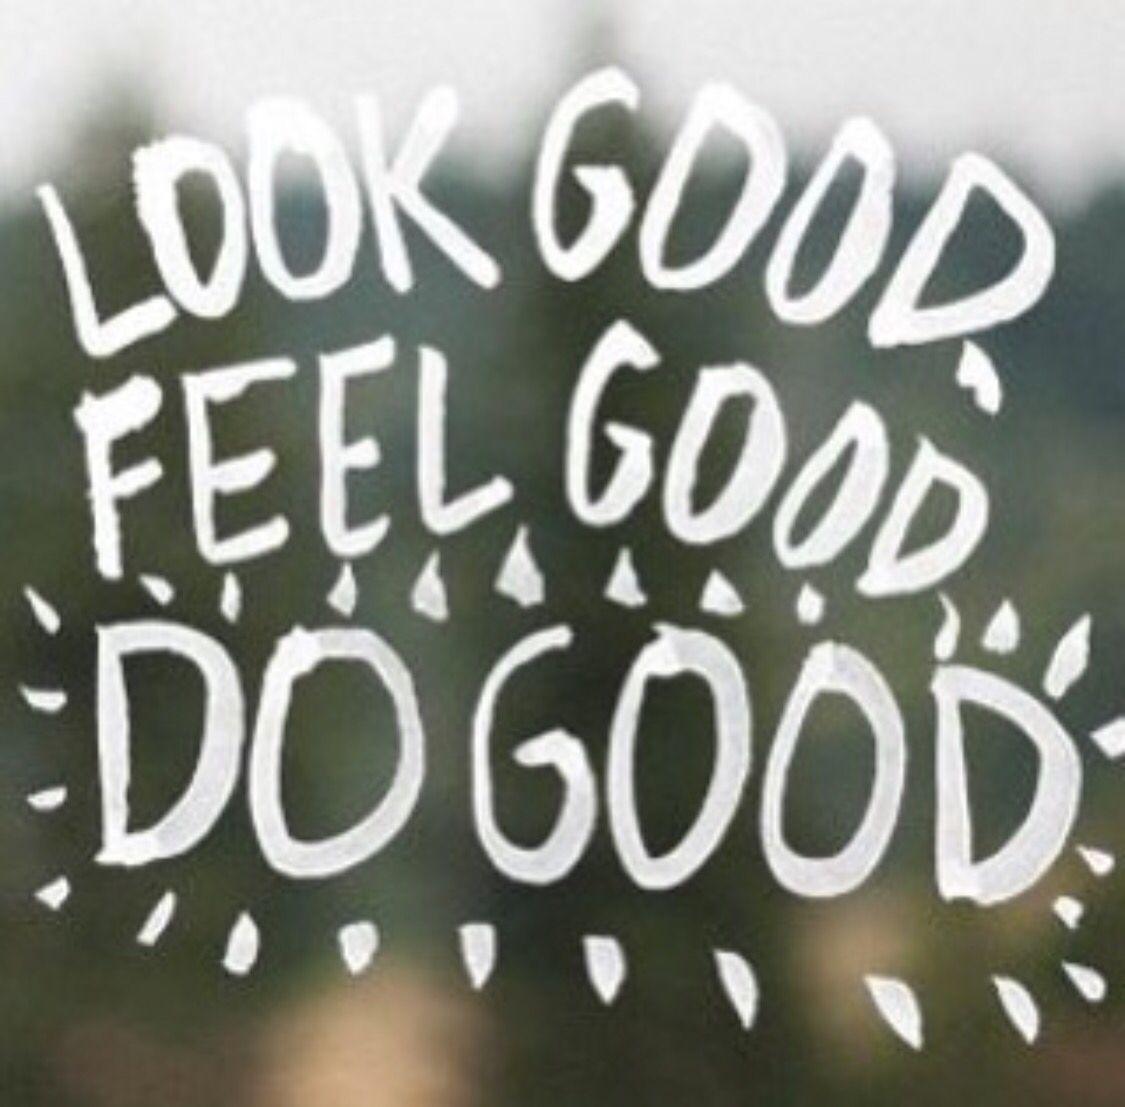 Look Good Feel Good Do Good Mantra Motto Inspiration